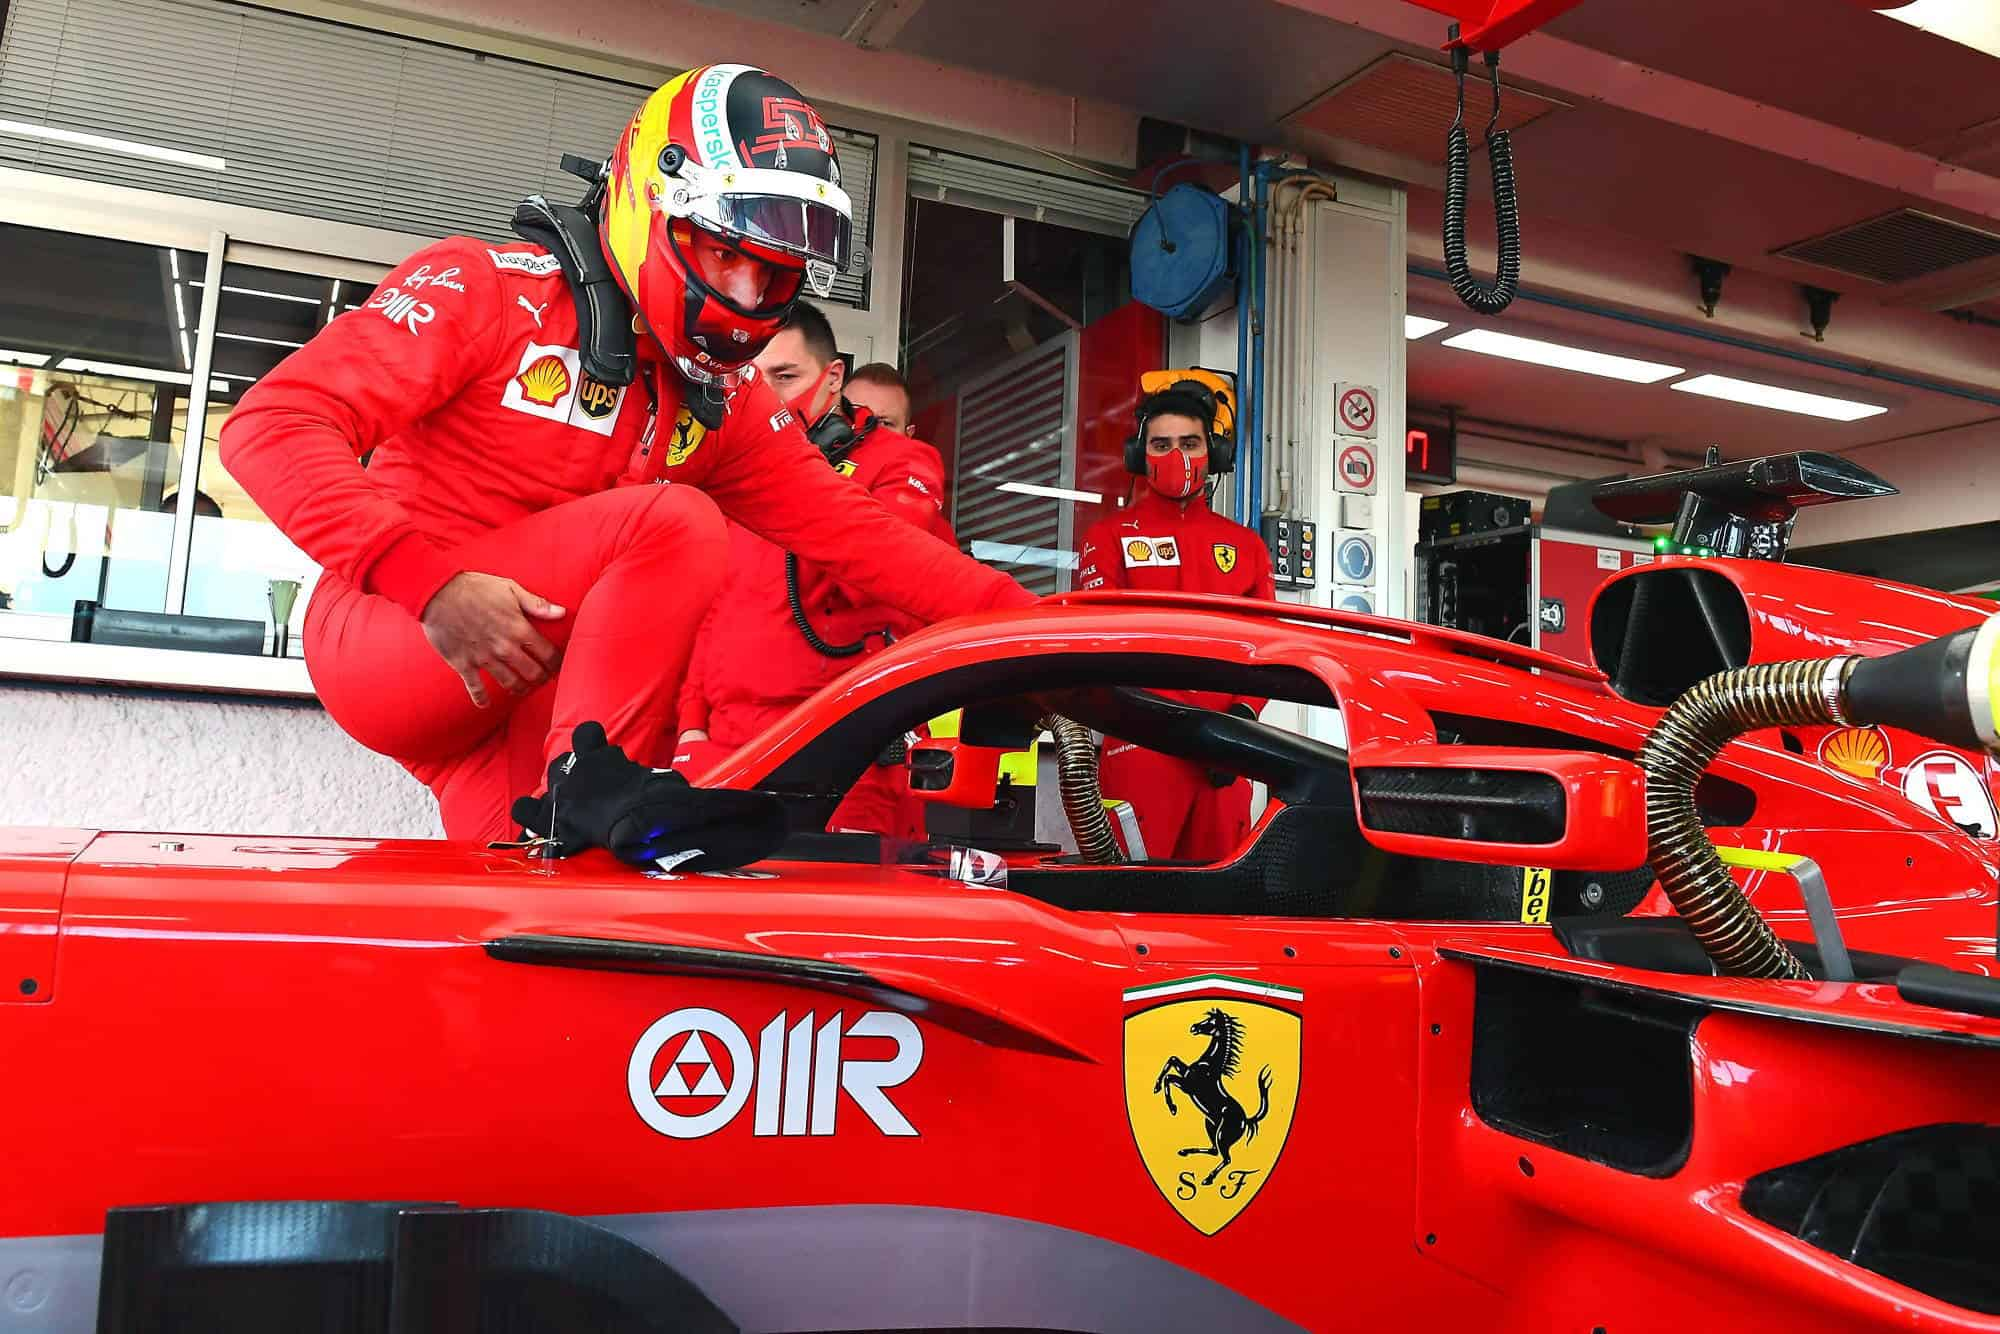 2021 Fiorano Carlos Sainz first Ferrari test enters the car Fiorano Ferrari SF71H 2018 on Wed 27 Jan 2021 Photo Ferrari